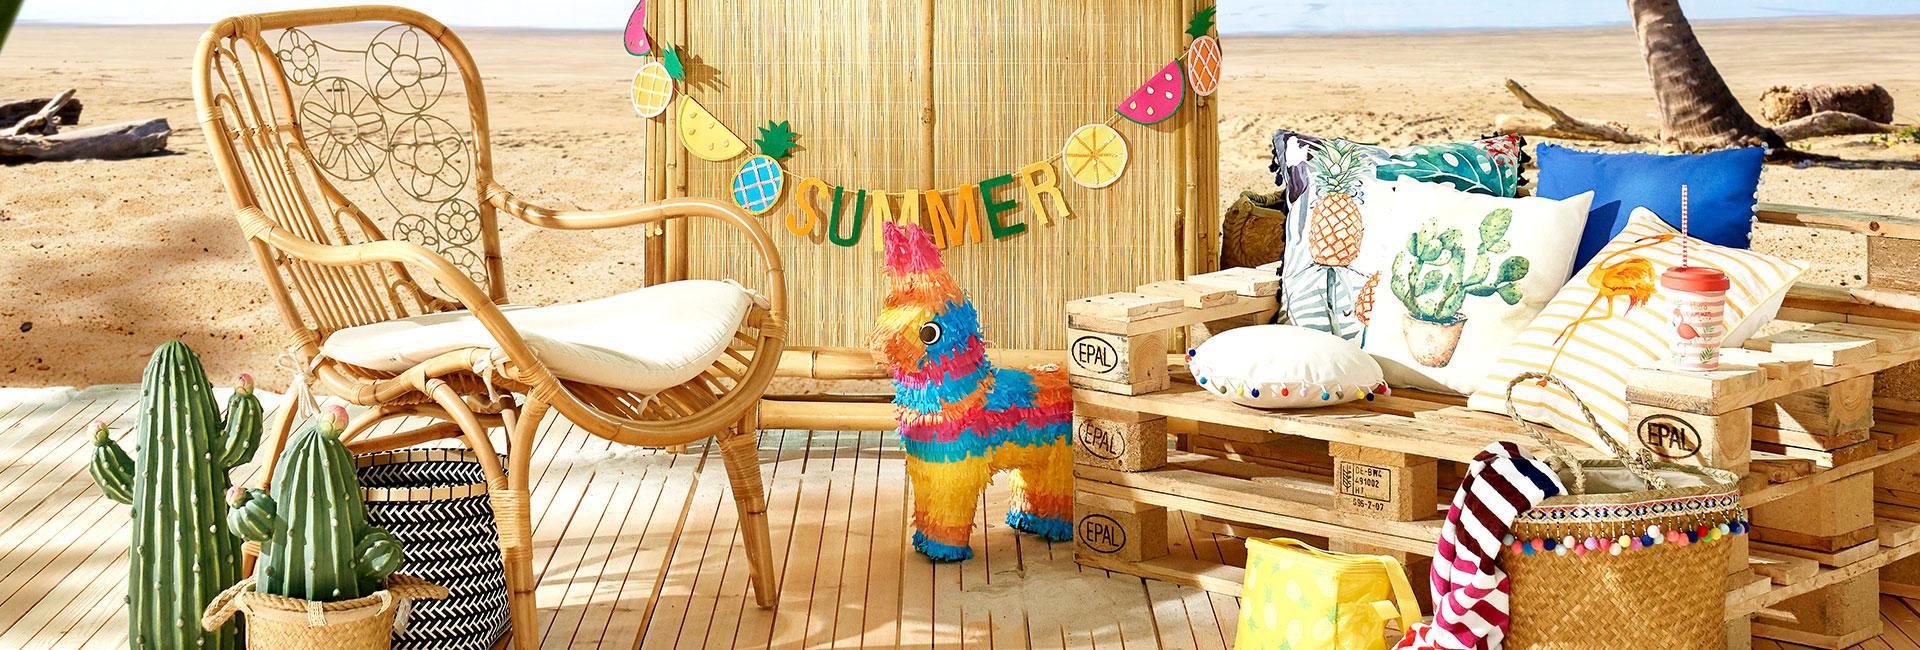 Yay, it's Summer! 1